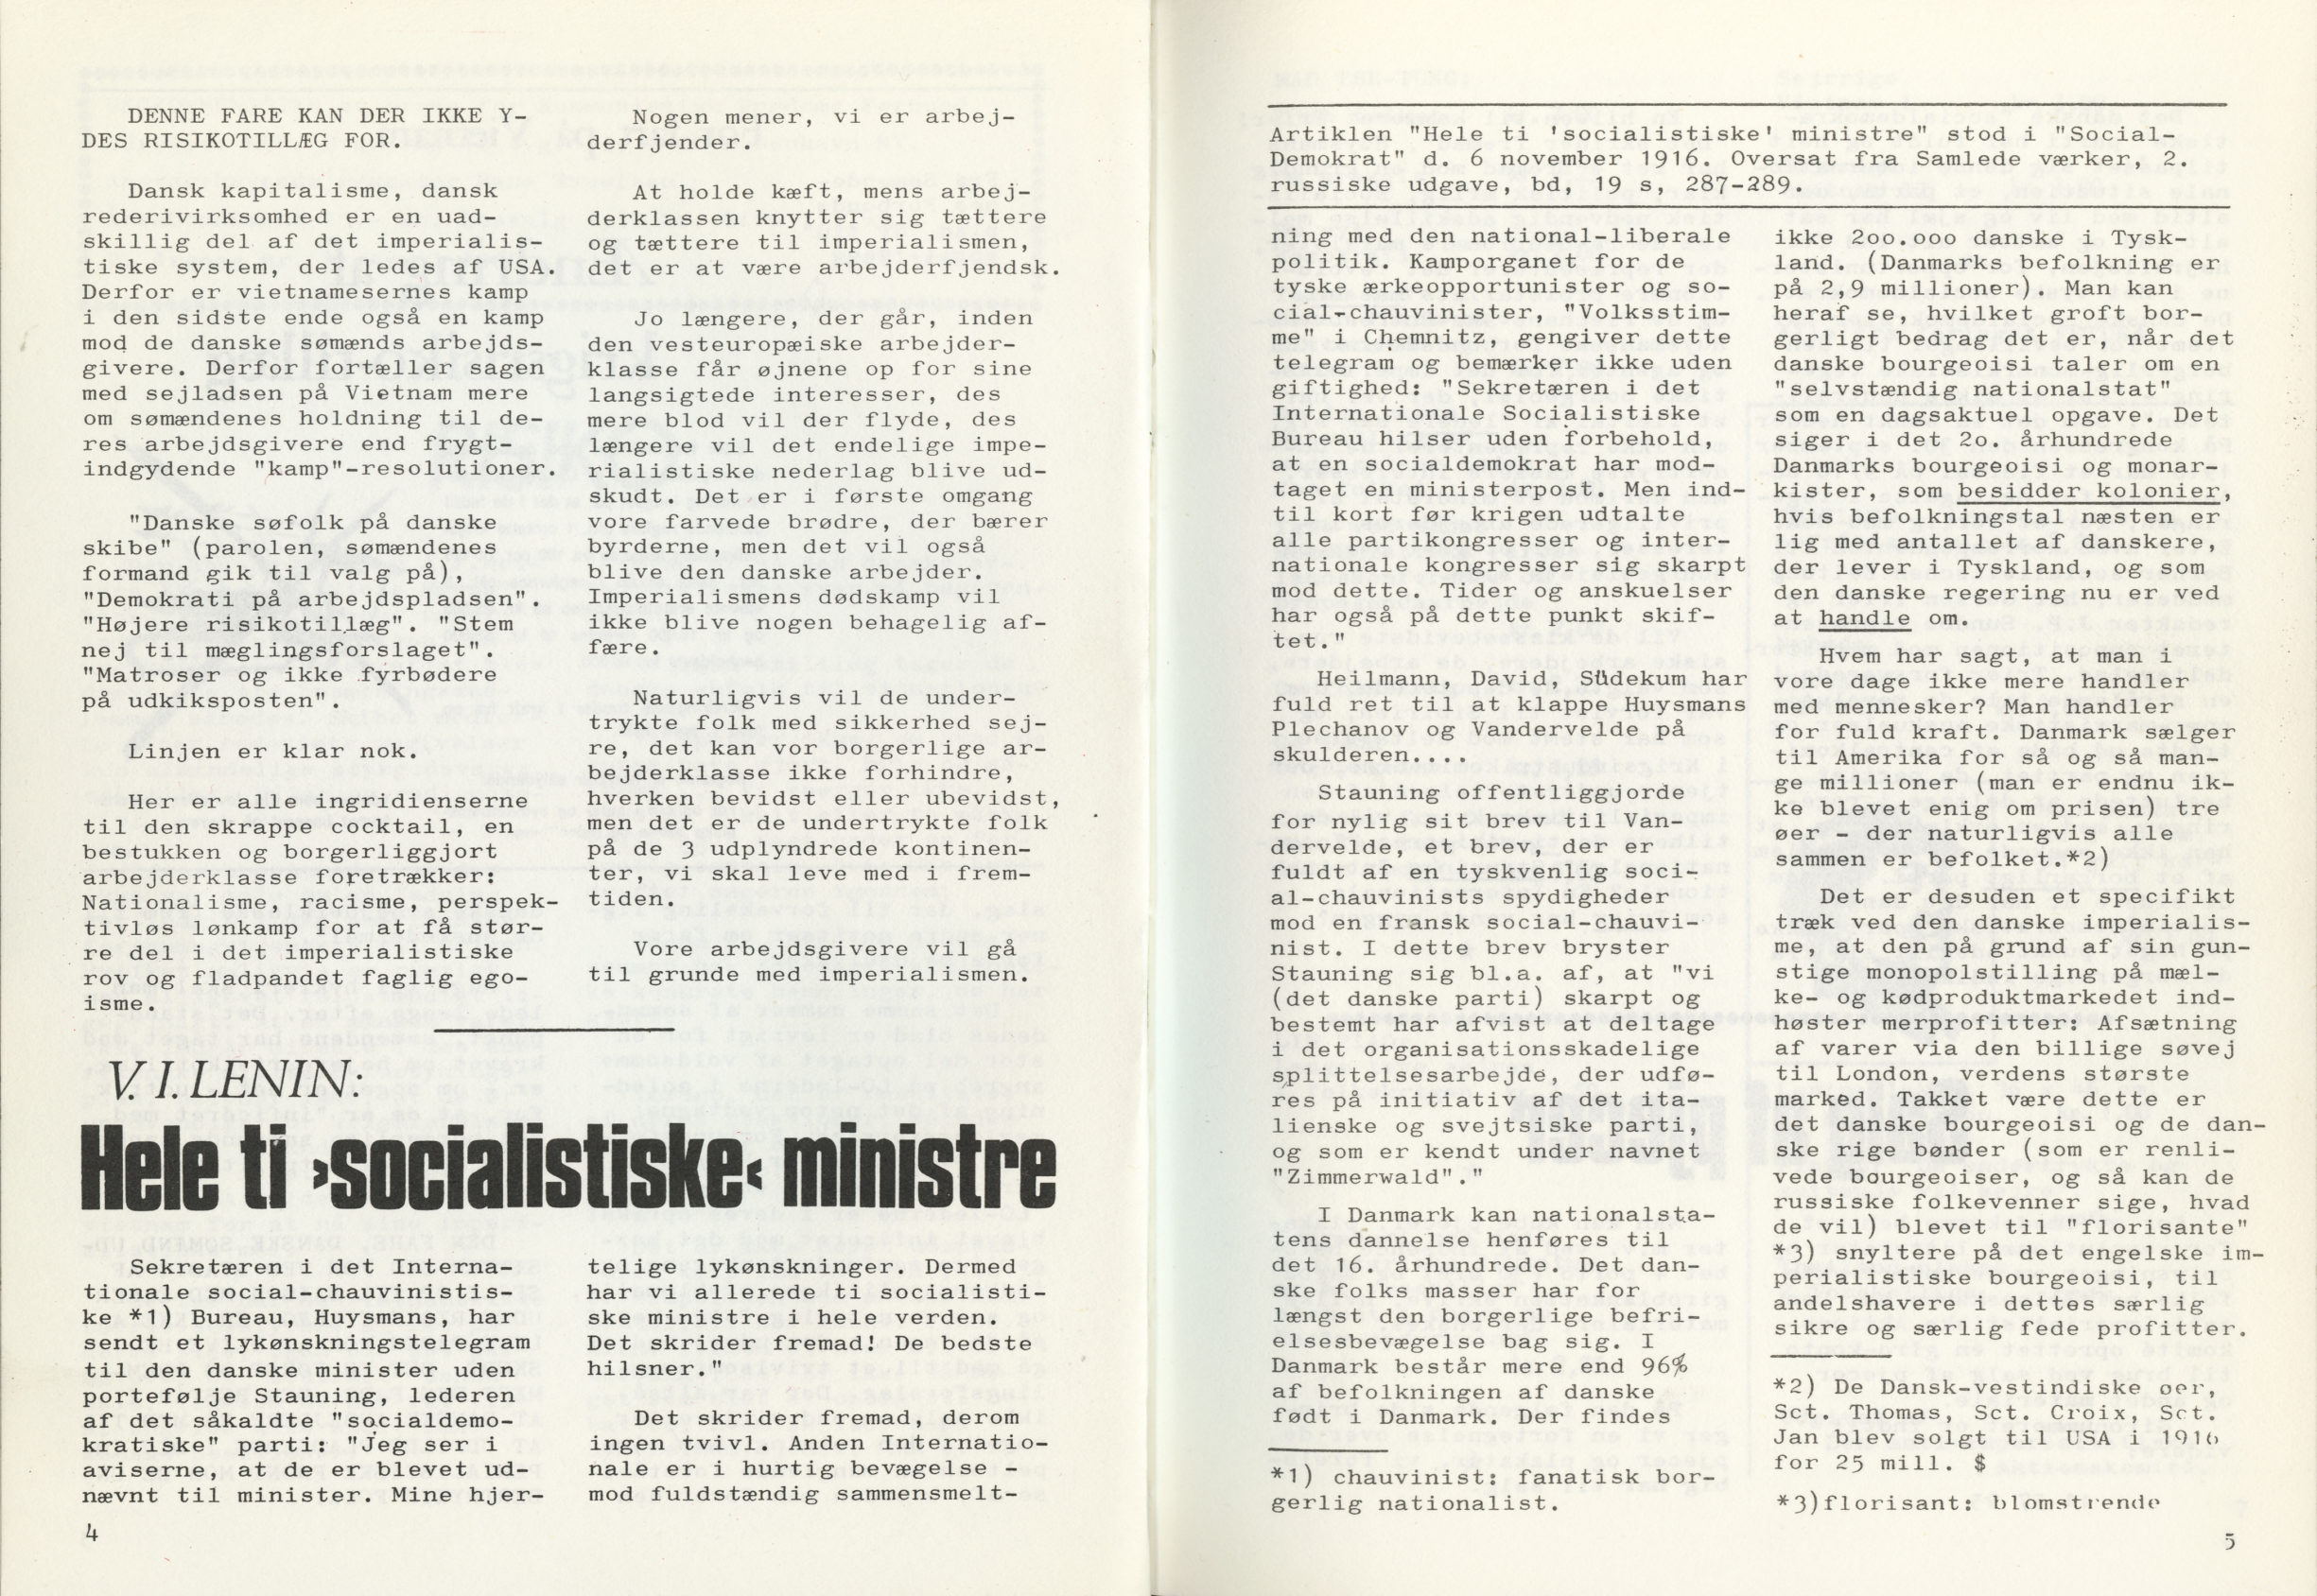 Ungkommunisten 1969, nr. 4, s 4-5.